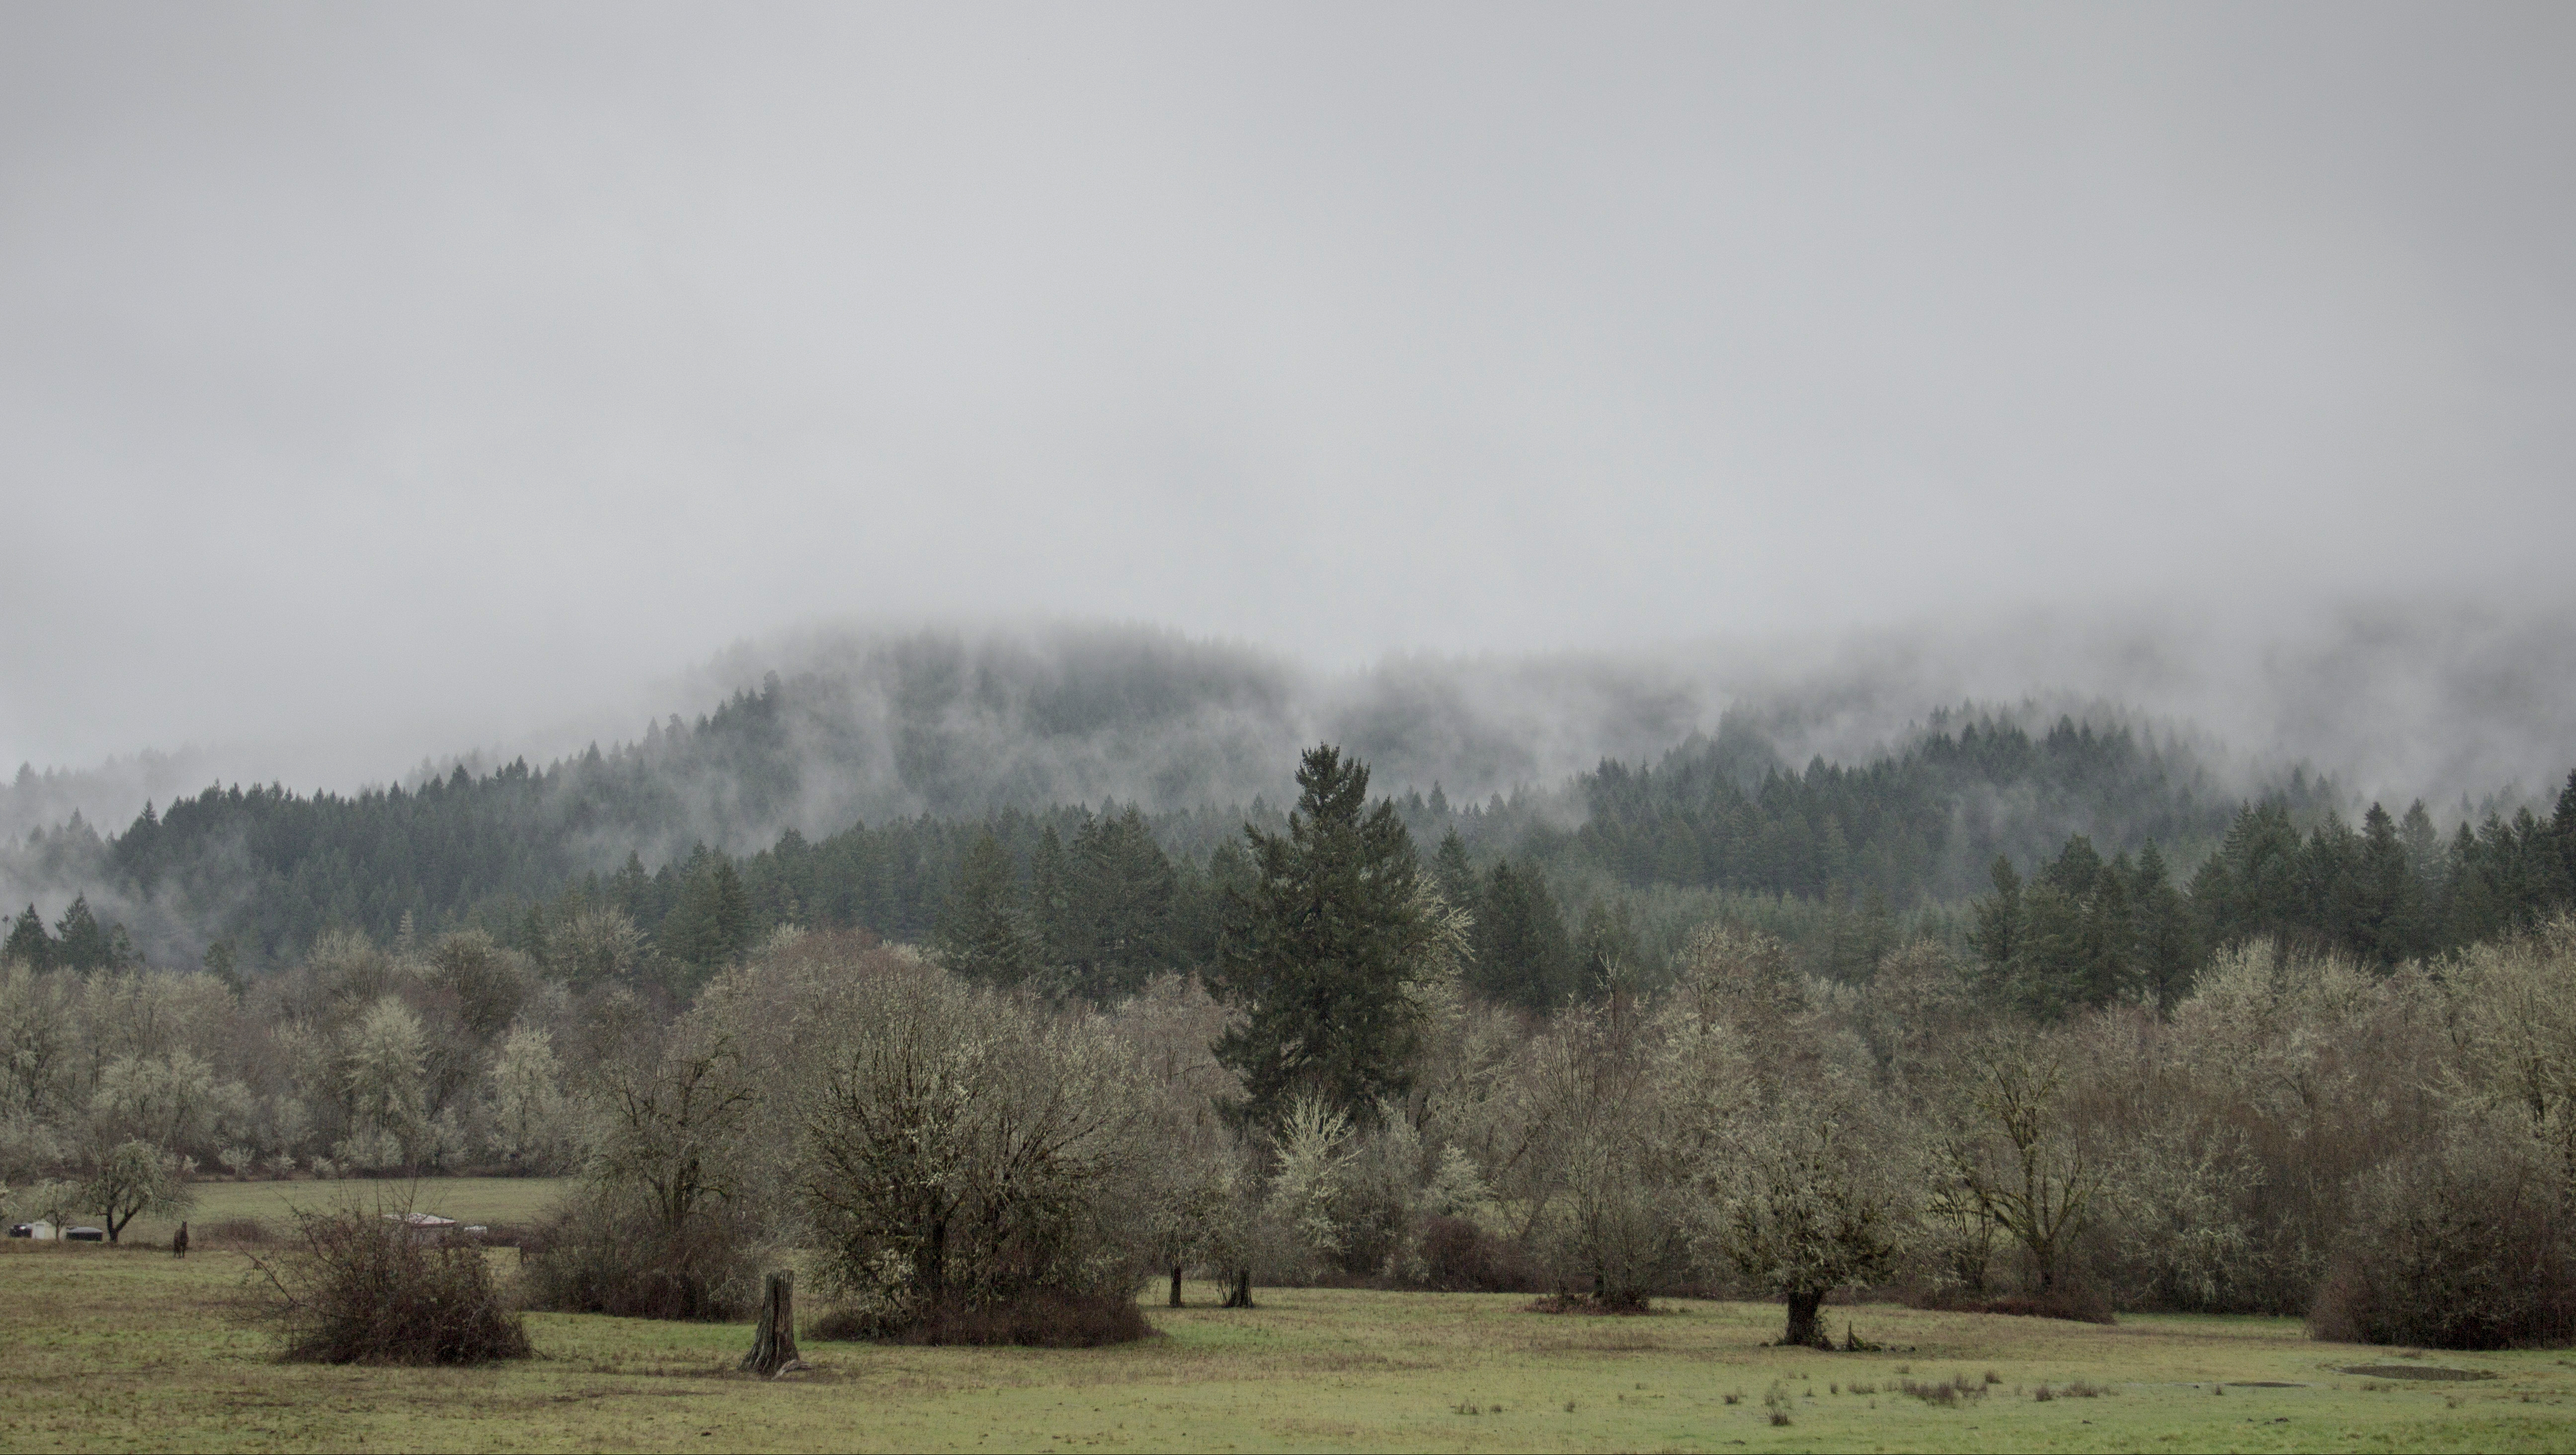 Coastal range in the winter, Oregon, Sky, Oregon, Snow, Tree, HQ Photo